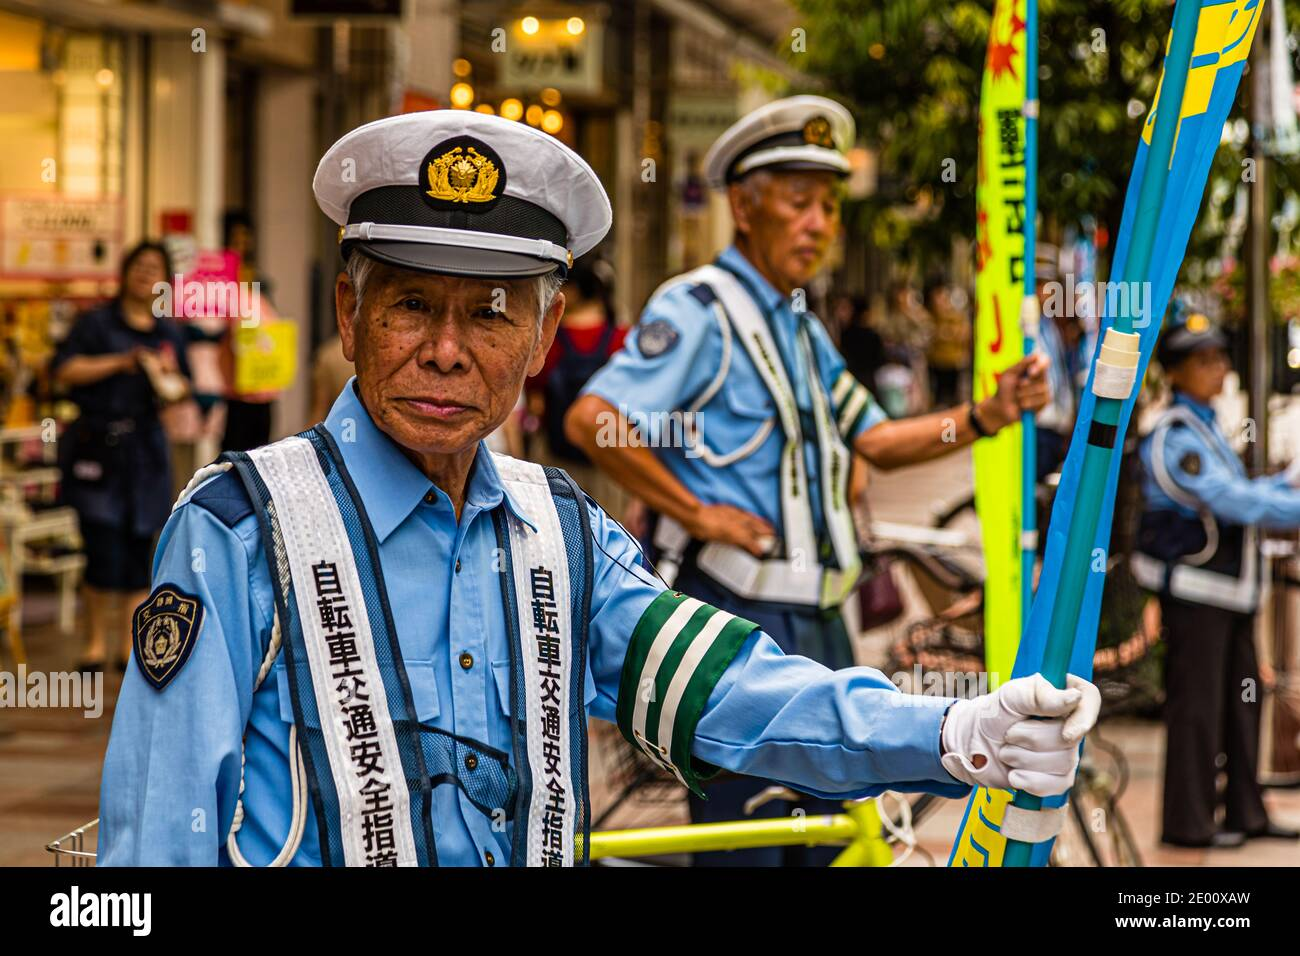 Demonstration of Policemen in Shizuoka, Japan Stock Photo